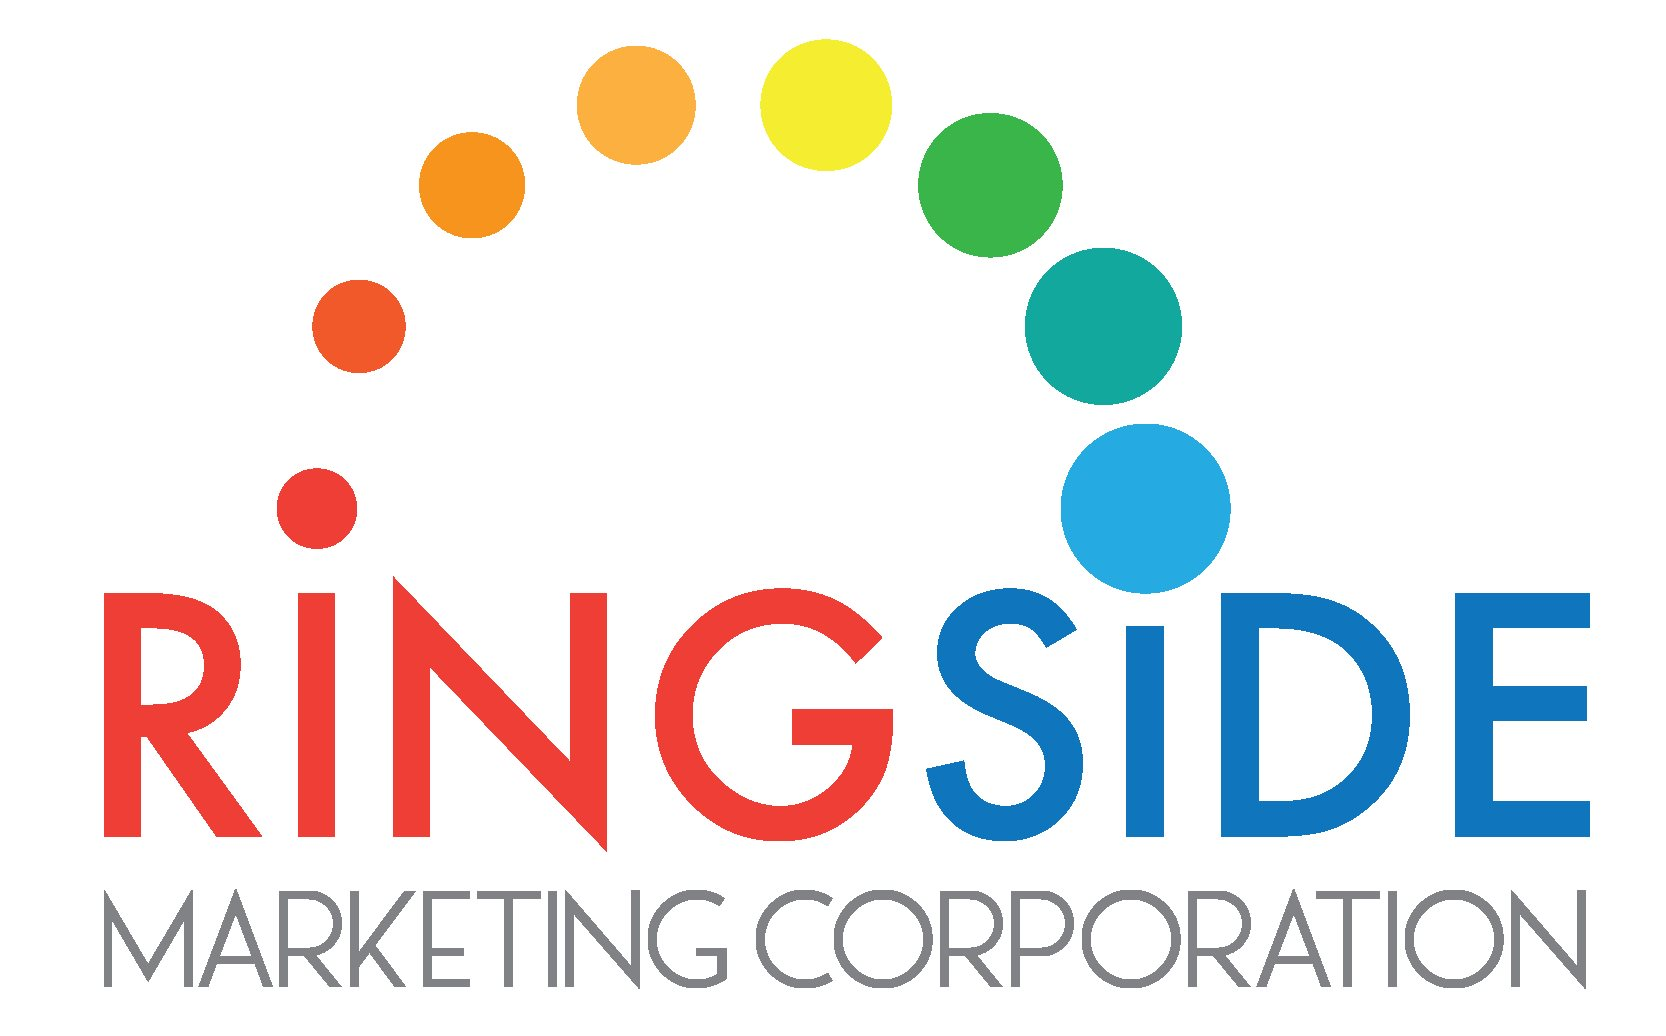 Ringside Marketing Corporation